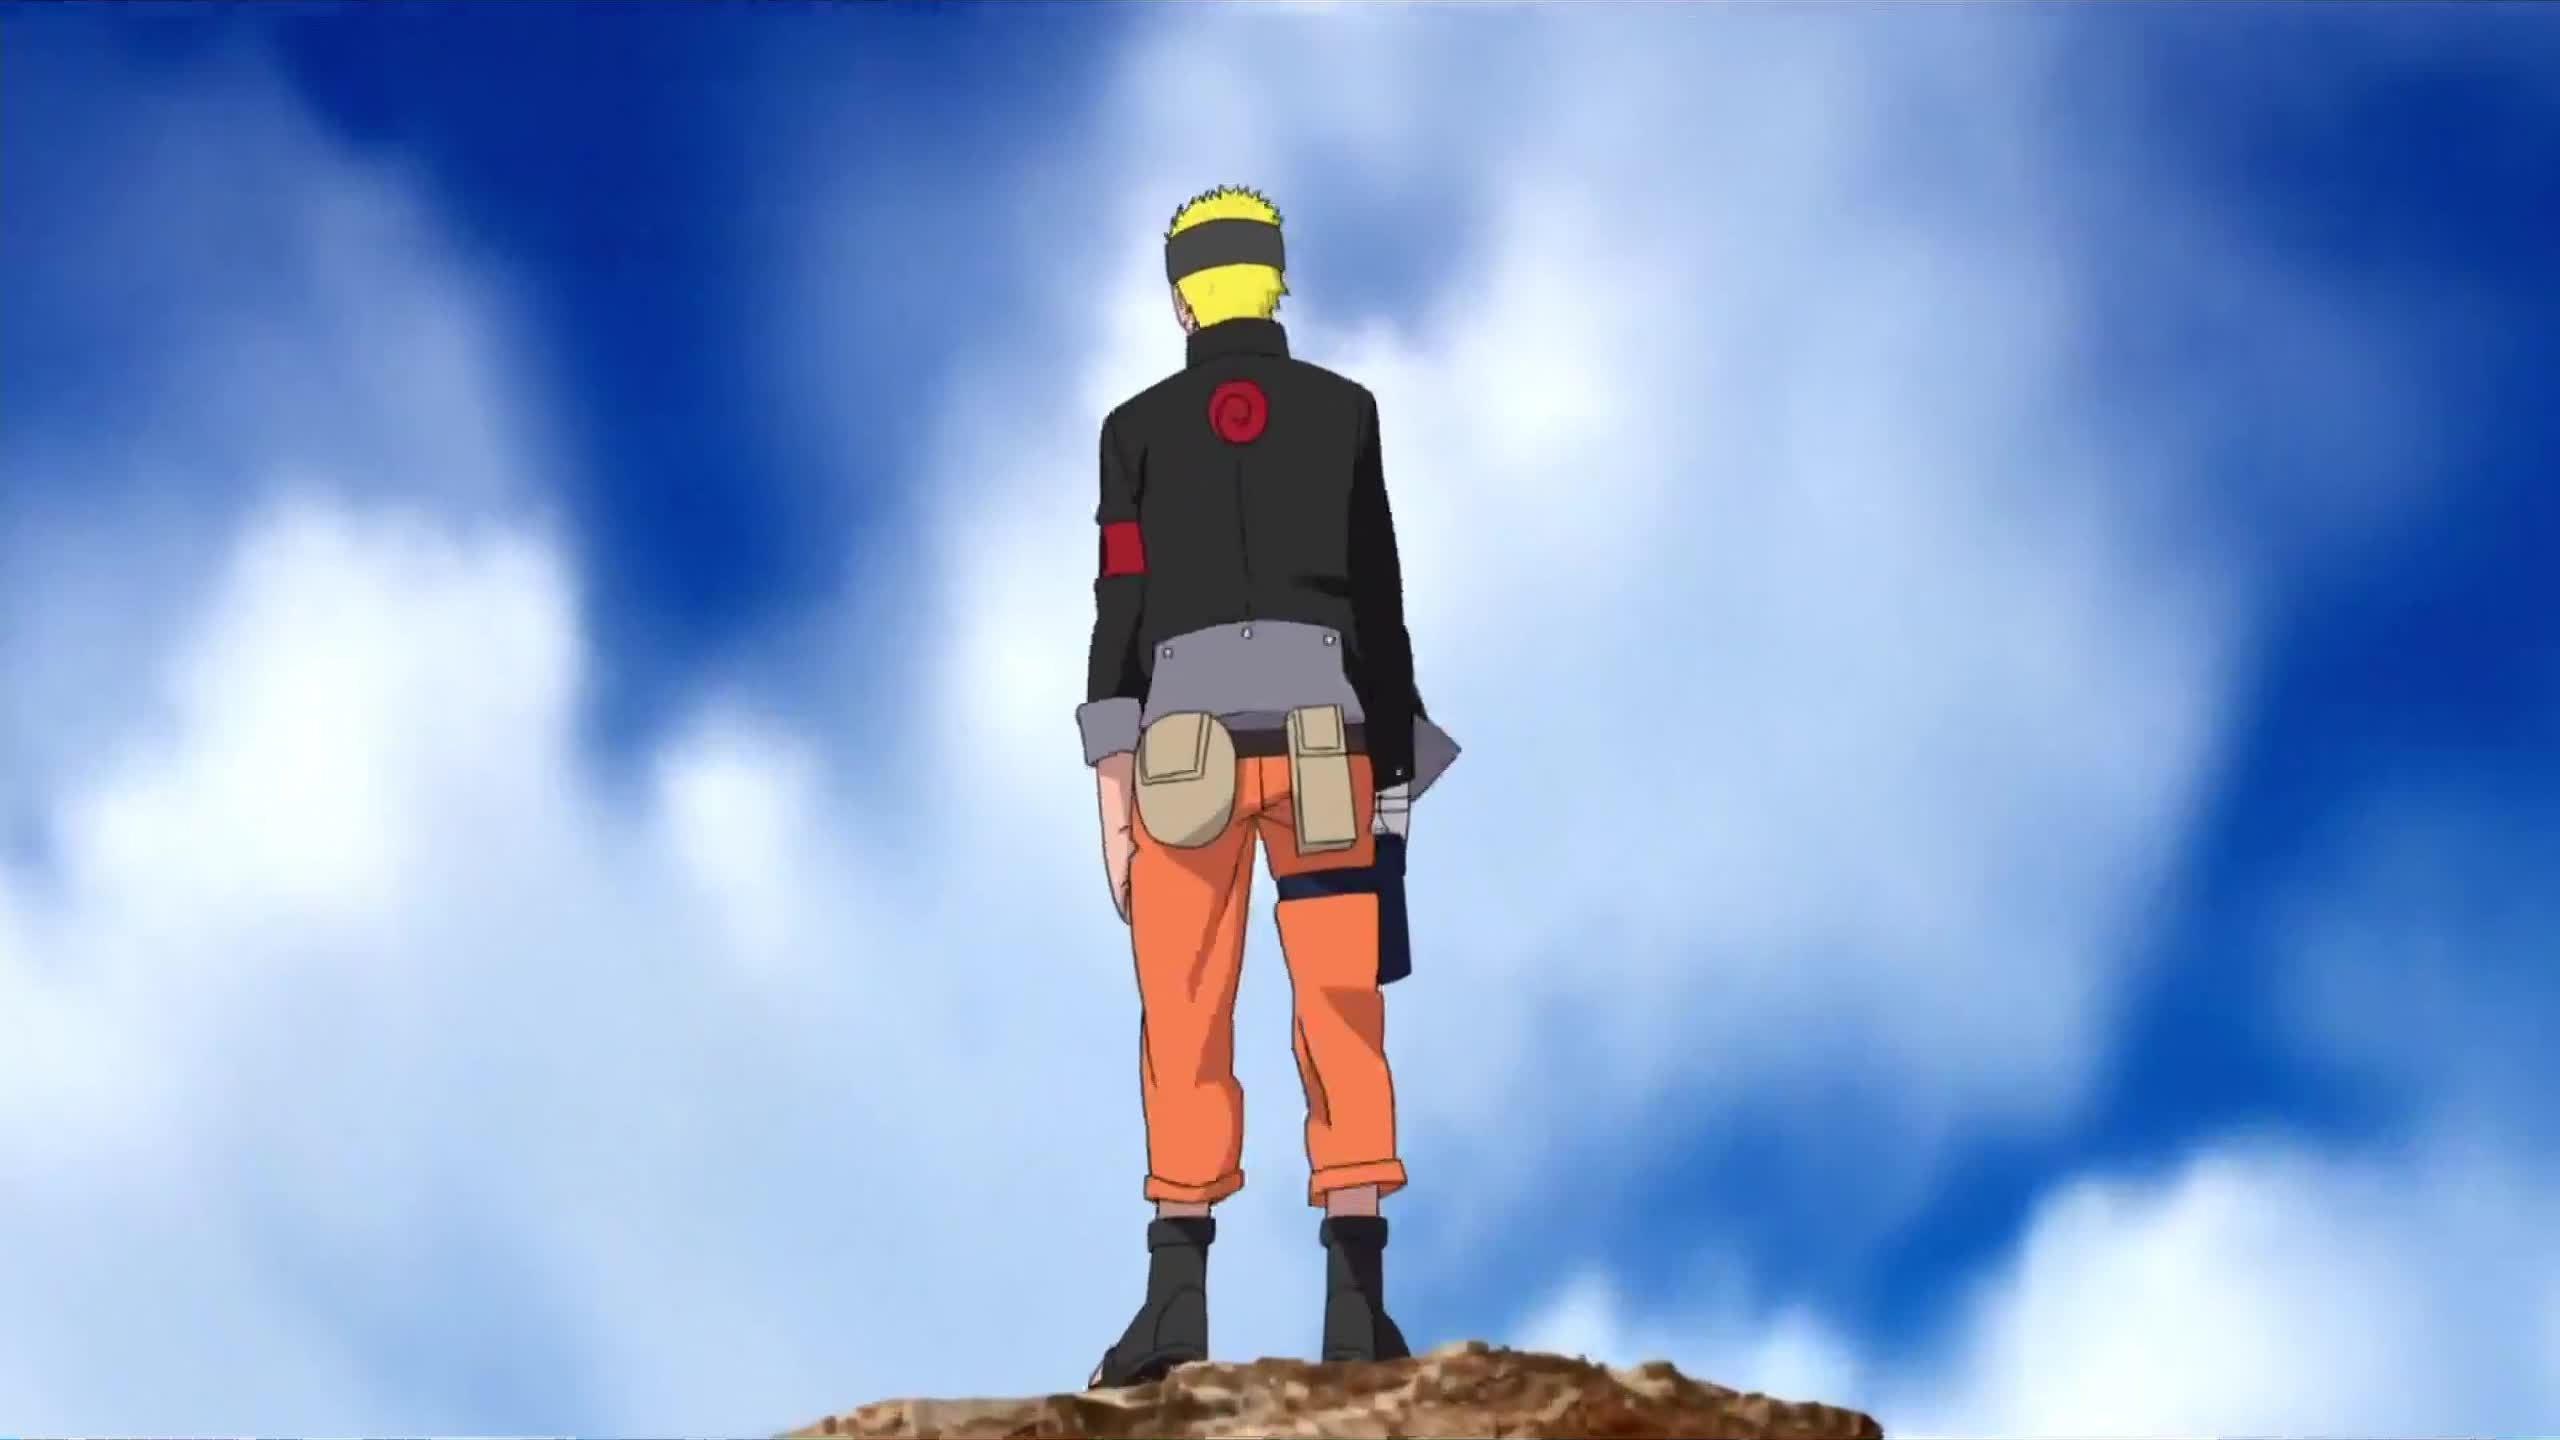 The Last Naruto Anime Movies Wallpaper Downlo 10909 Wallpaper High 2560x1440